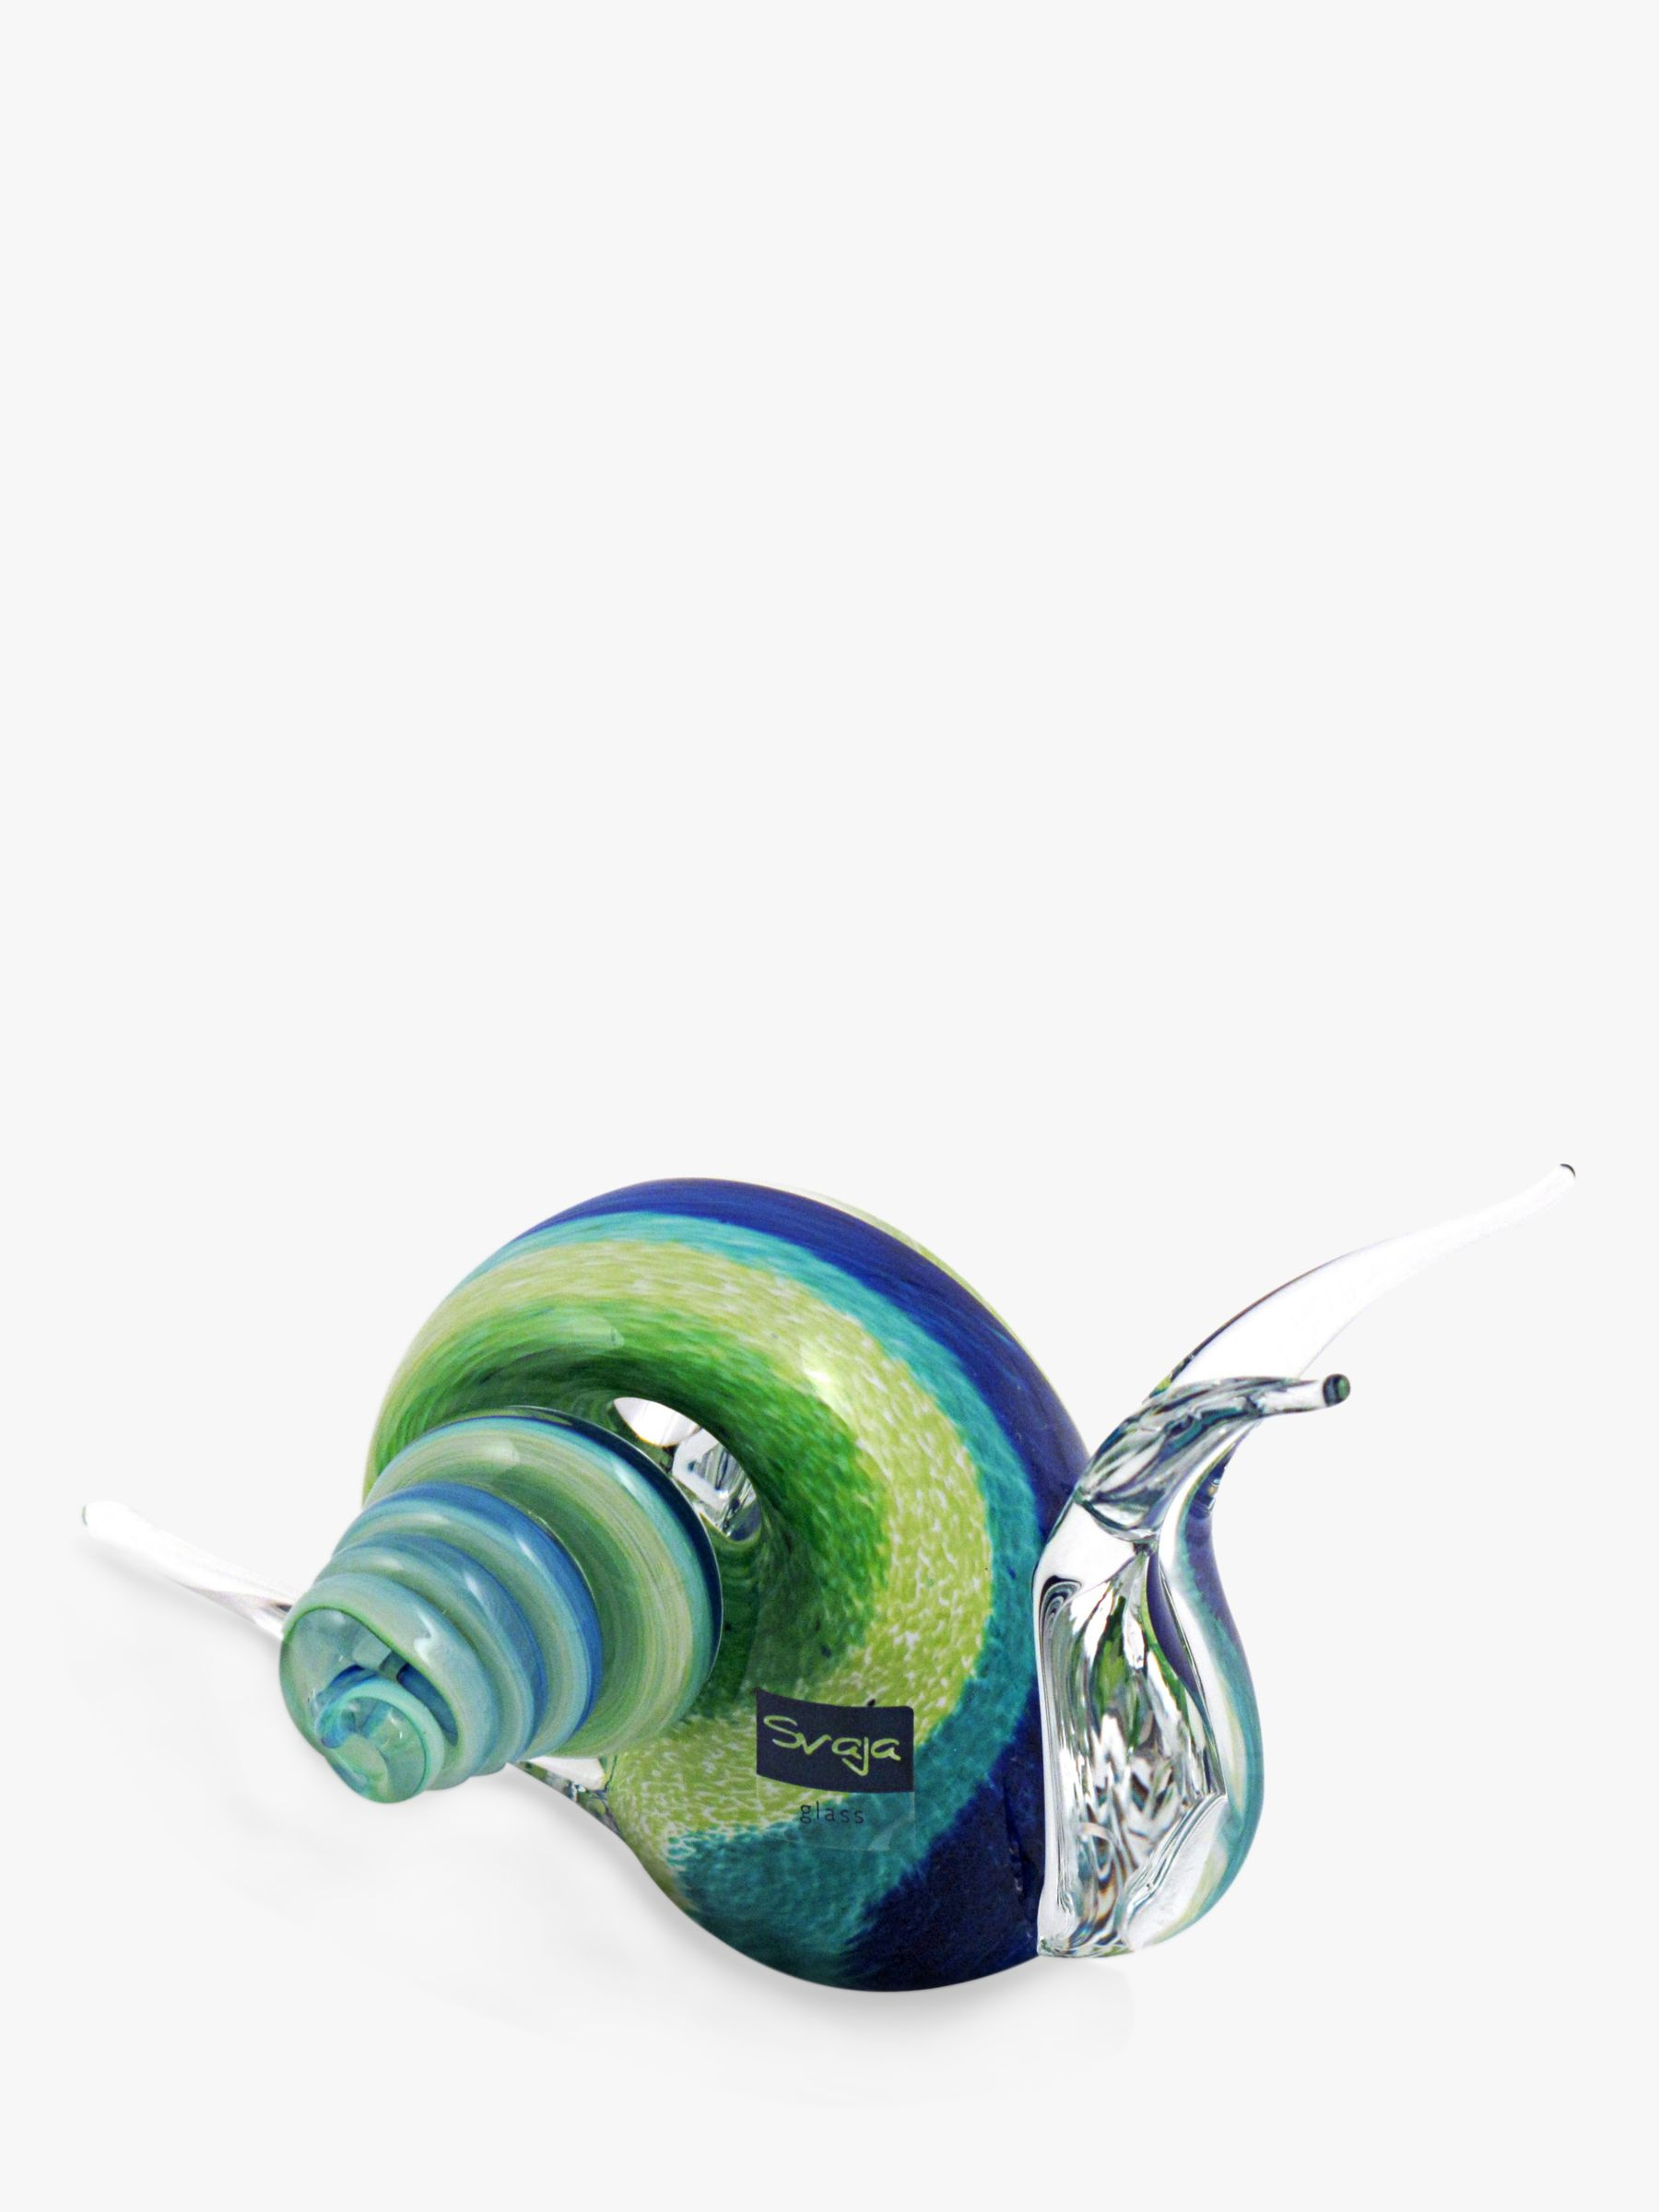 Svaja Svaja Sidney Snail Junior Ornament, Blue/Green